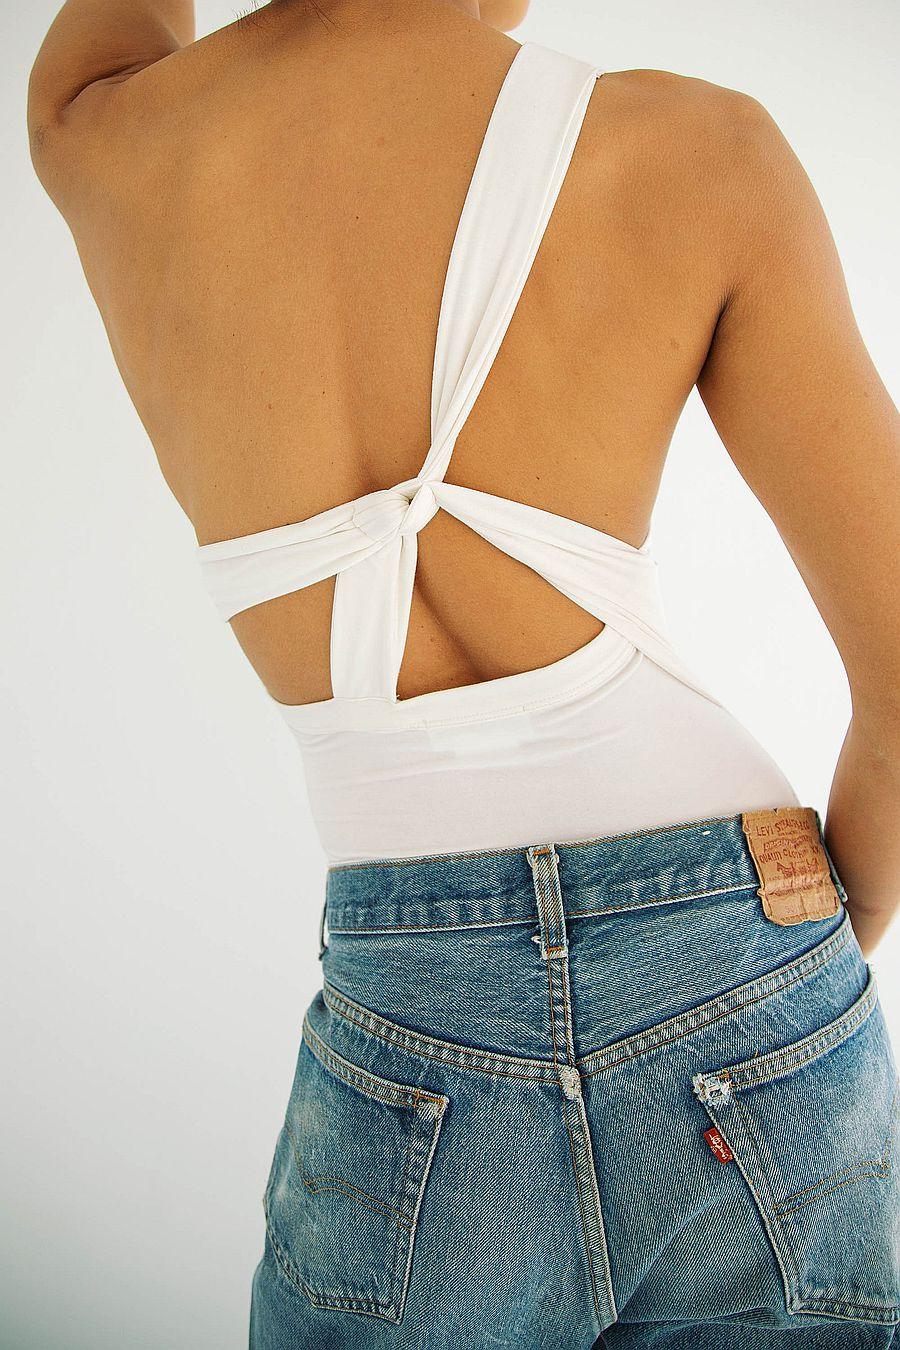 The Line by K Aisling Bodysuit - Vanilla